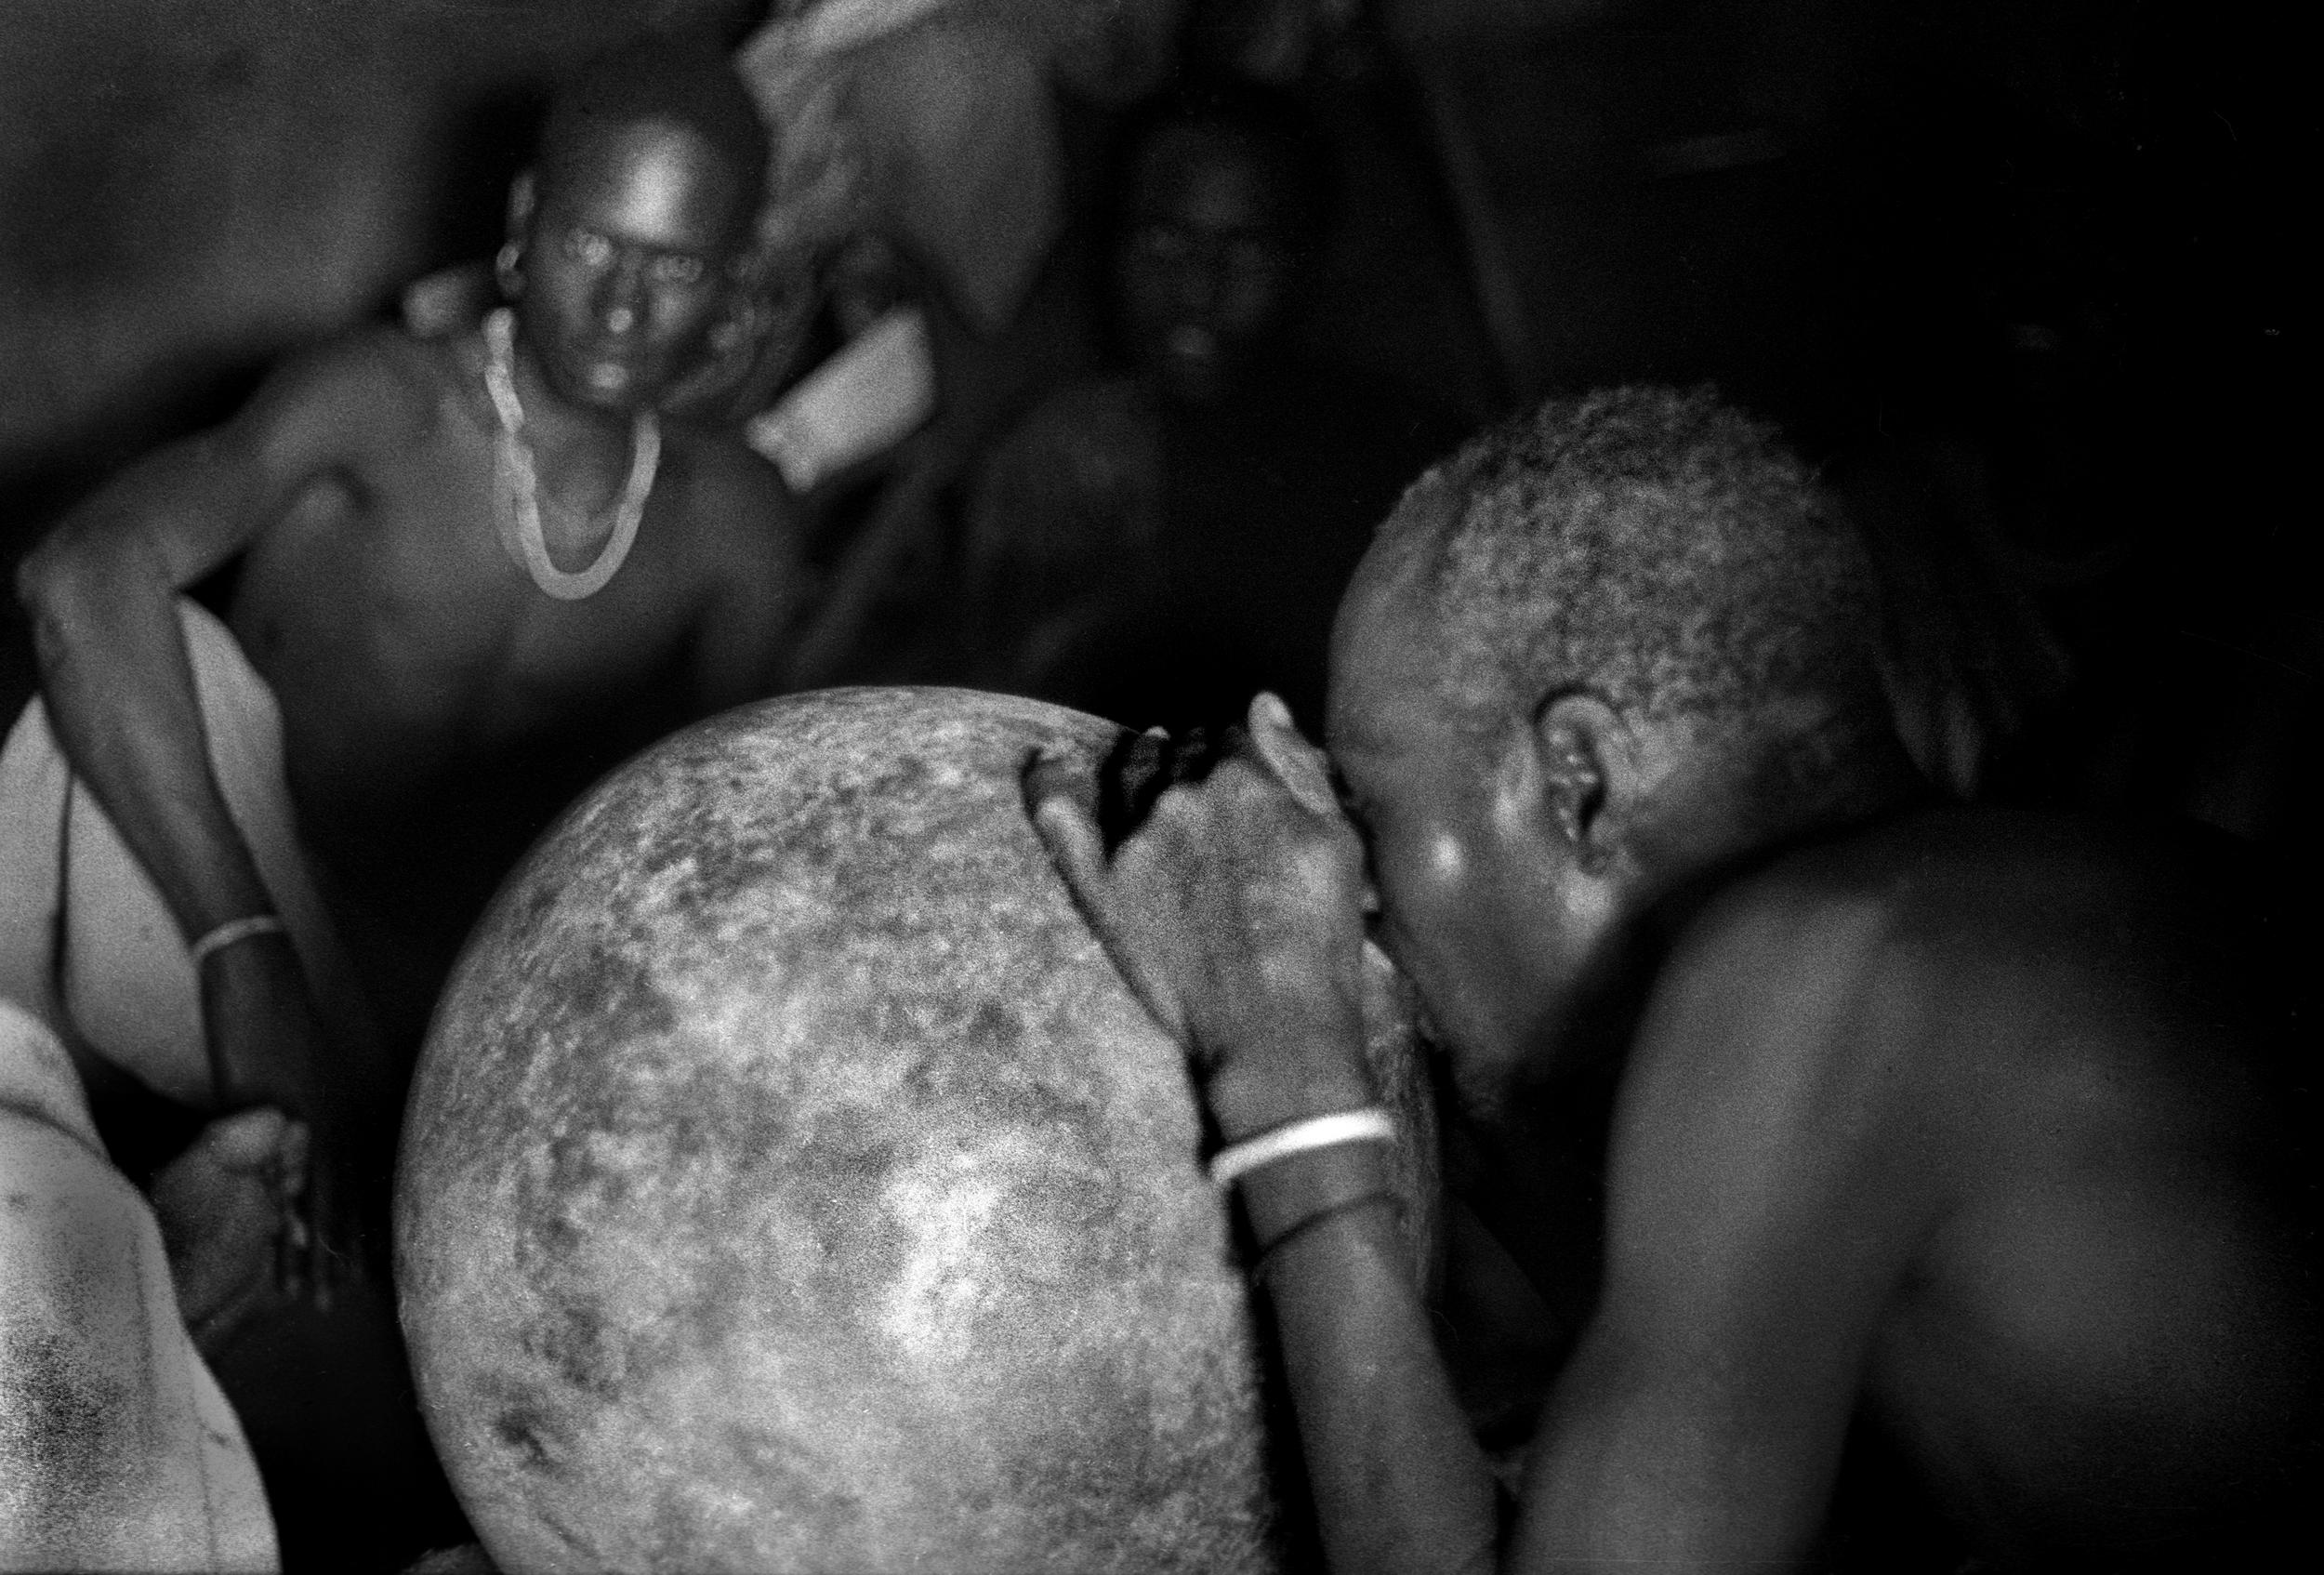 Karamojong warriors drinking sorghum beer, Uganda